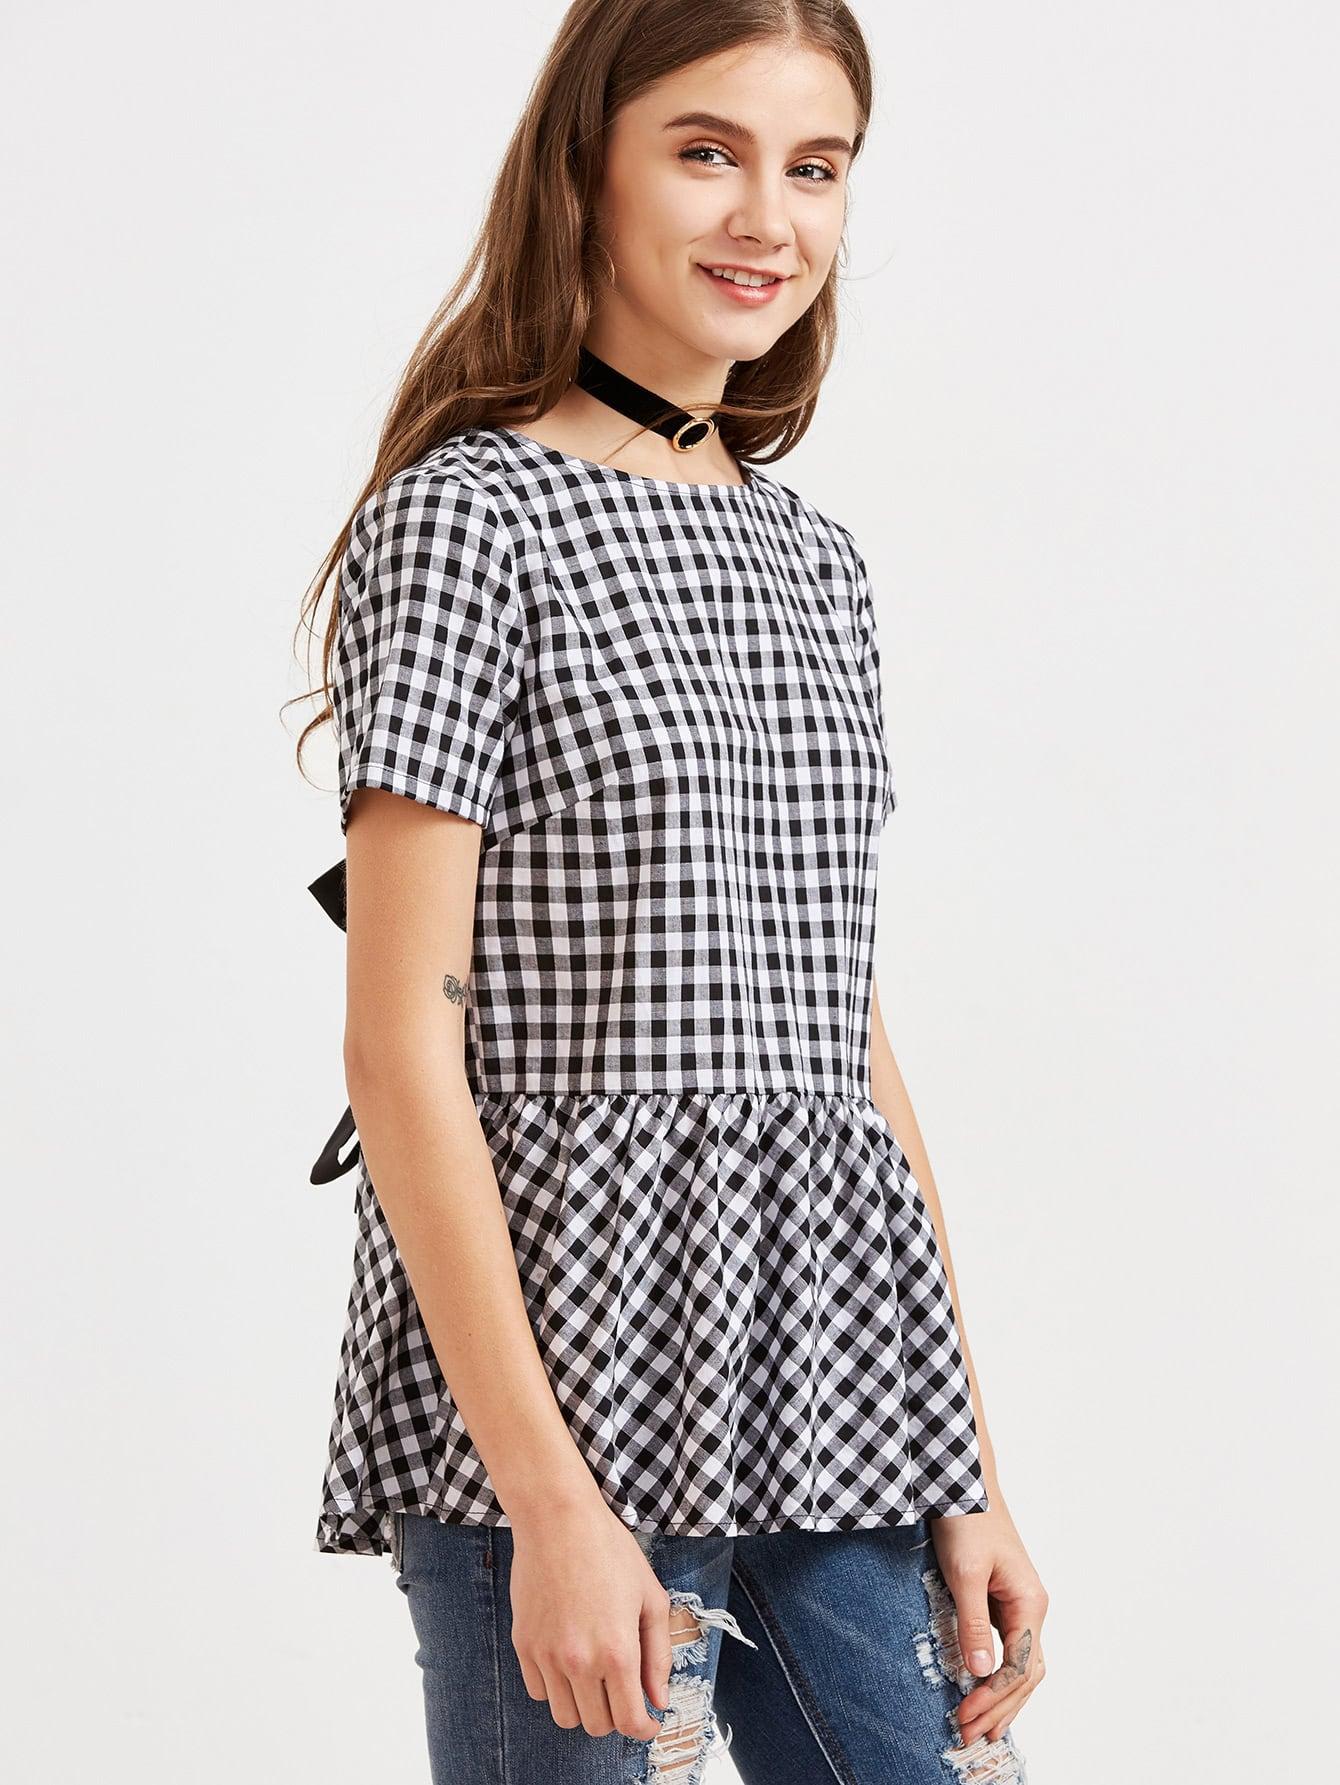 blouse170213703_2